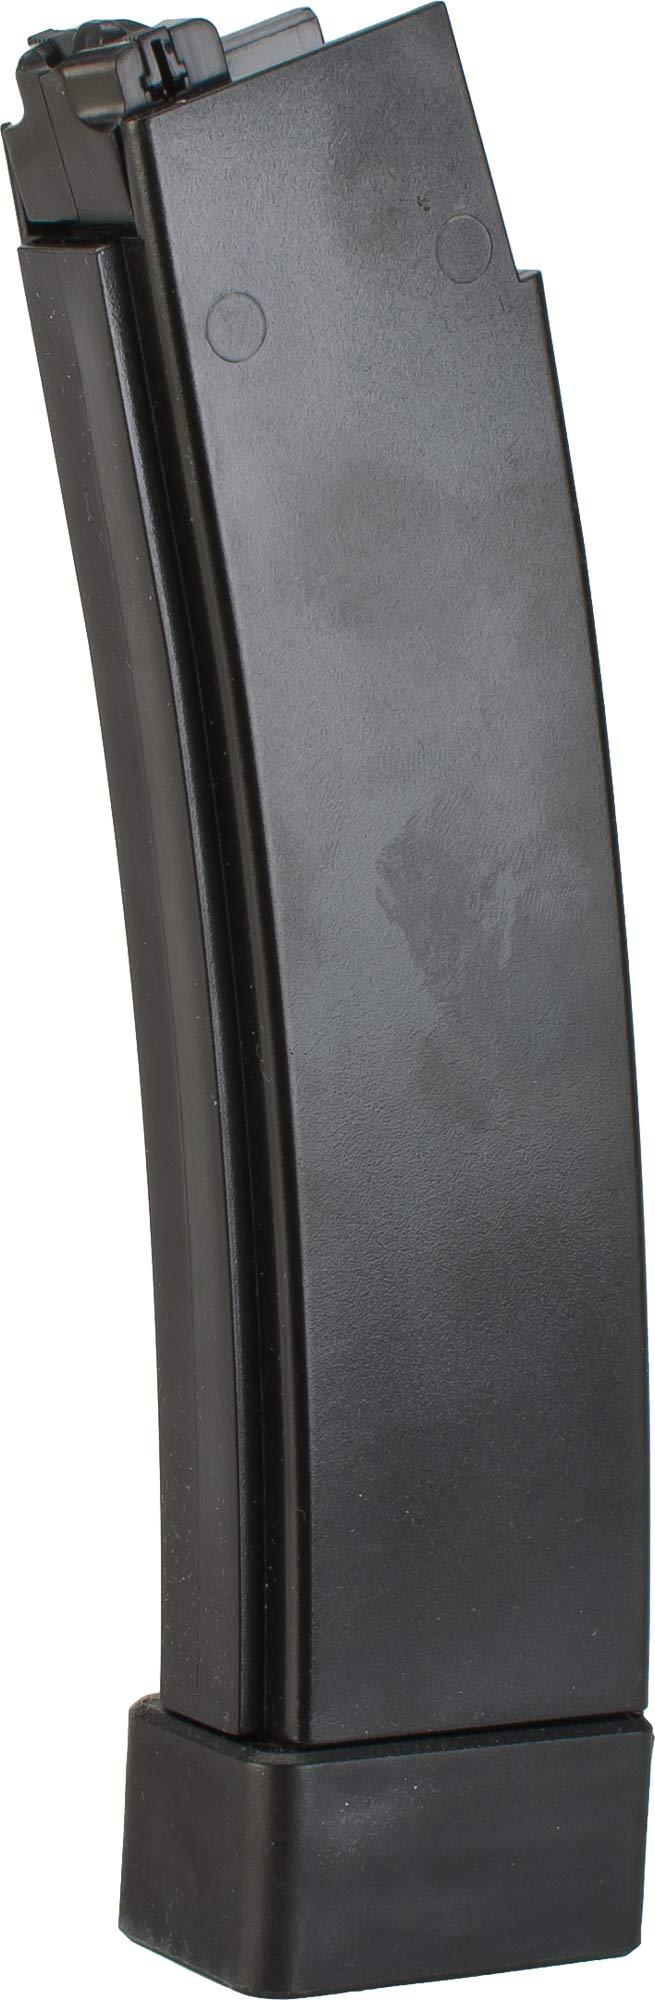 Evike ASG 75rd Standard Airsoft Magazine for CZ Scorpion EVO 3 A1 AEG - Black (Box of 3) by Evike